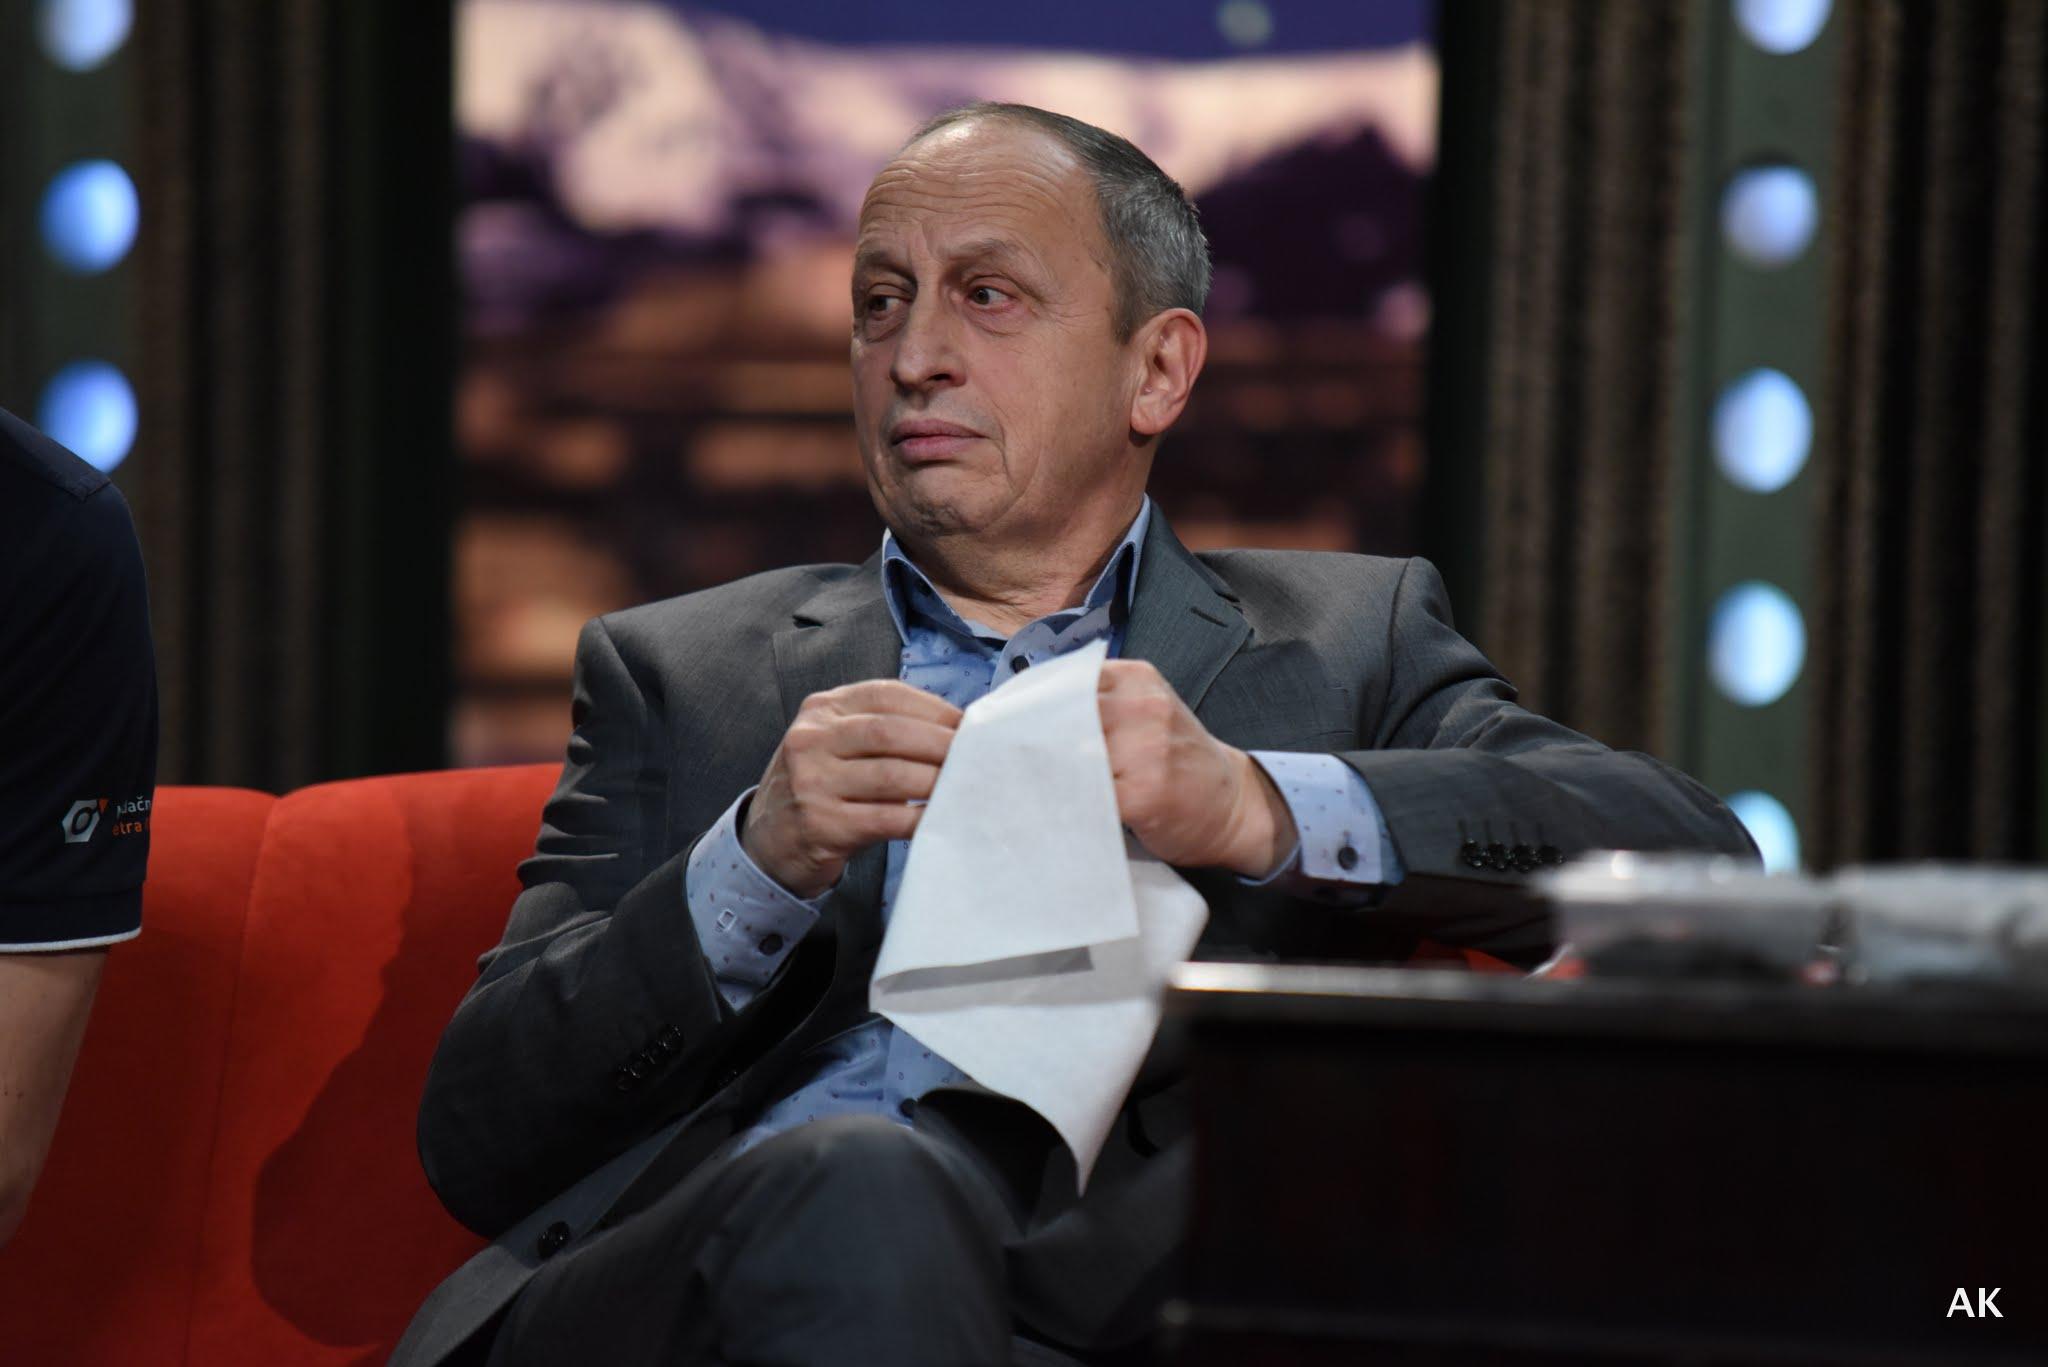 Moderátor Jan Kraus usedl ke stolu šéfkuchaře Radka Kašpárka v SJK 30. 3. 2016